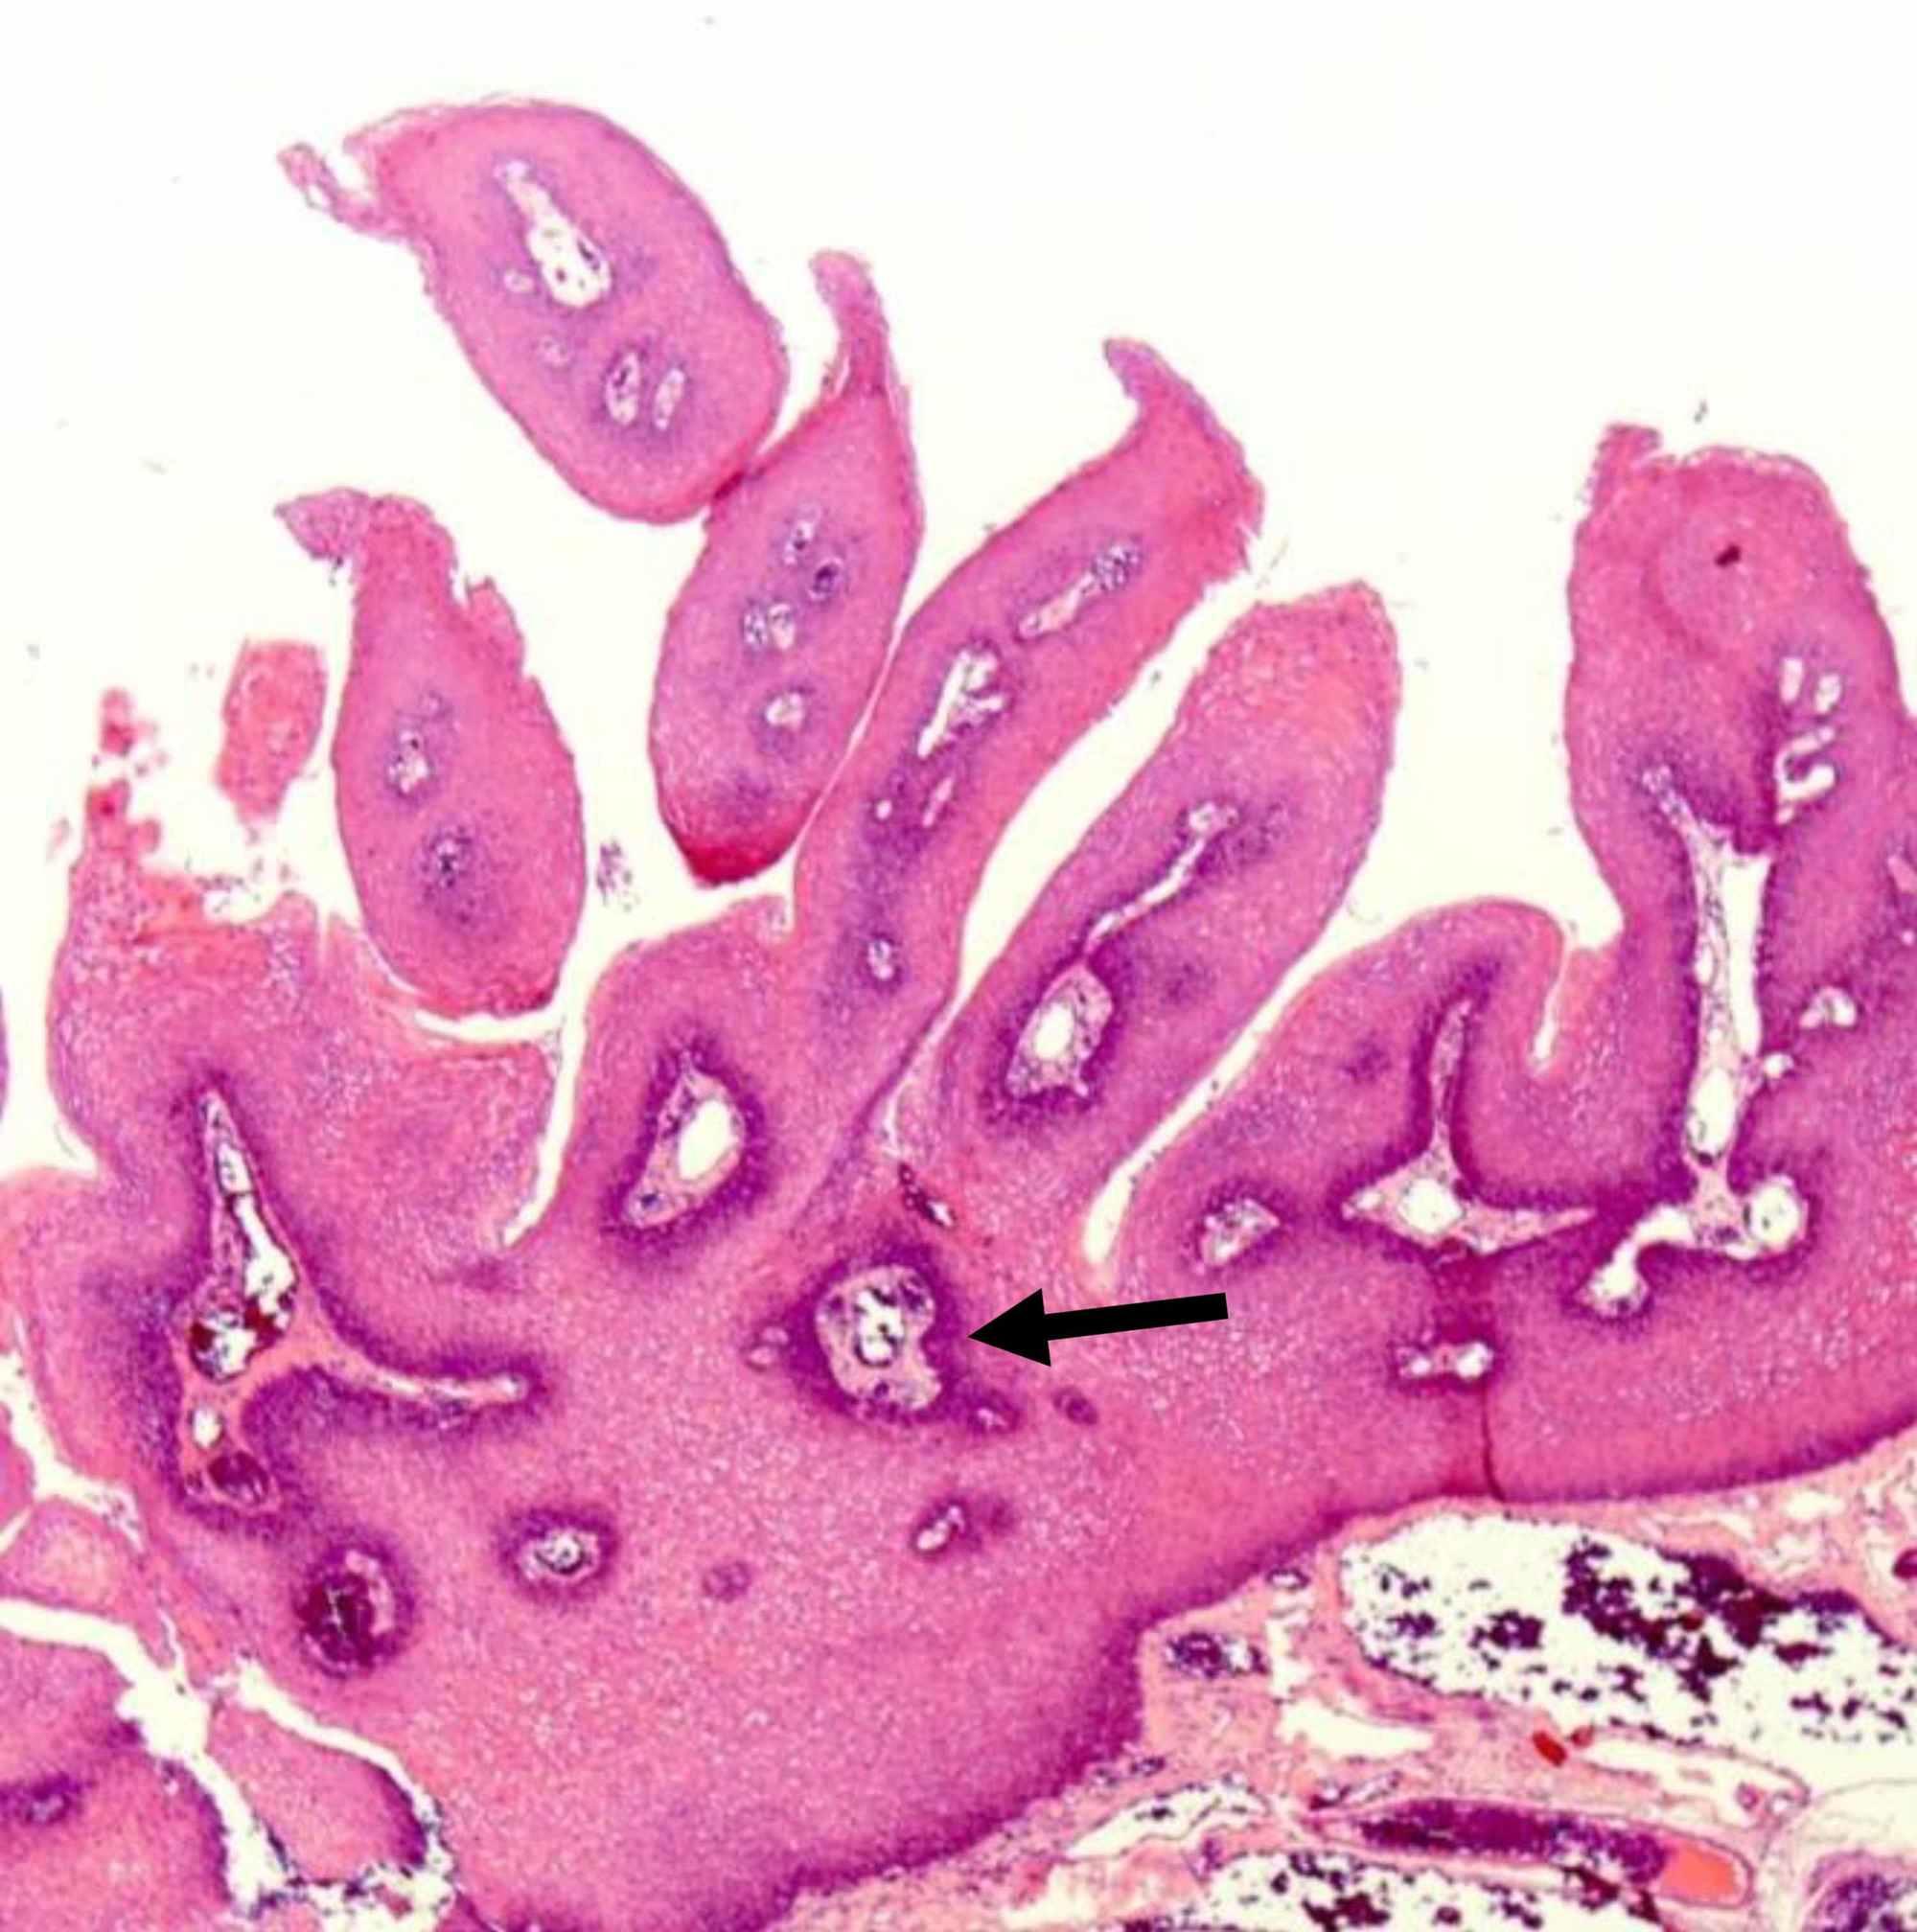 benign squamous cell papilloma